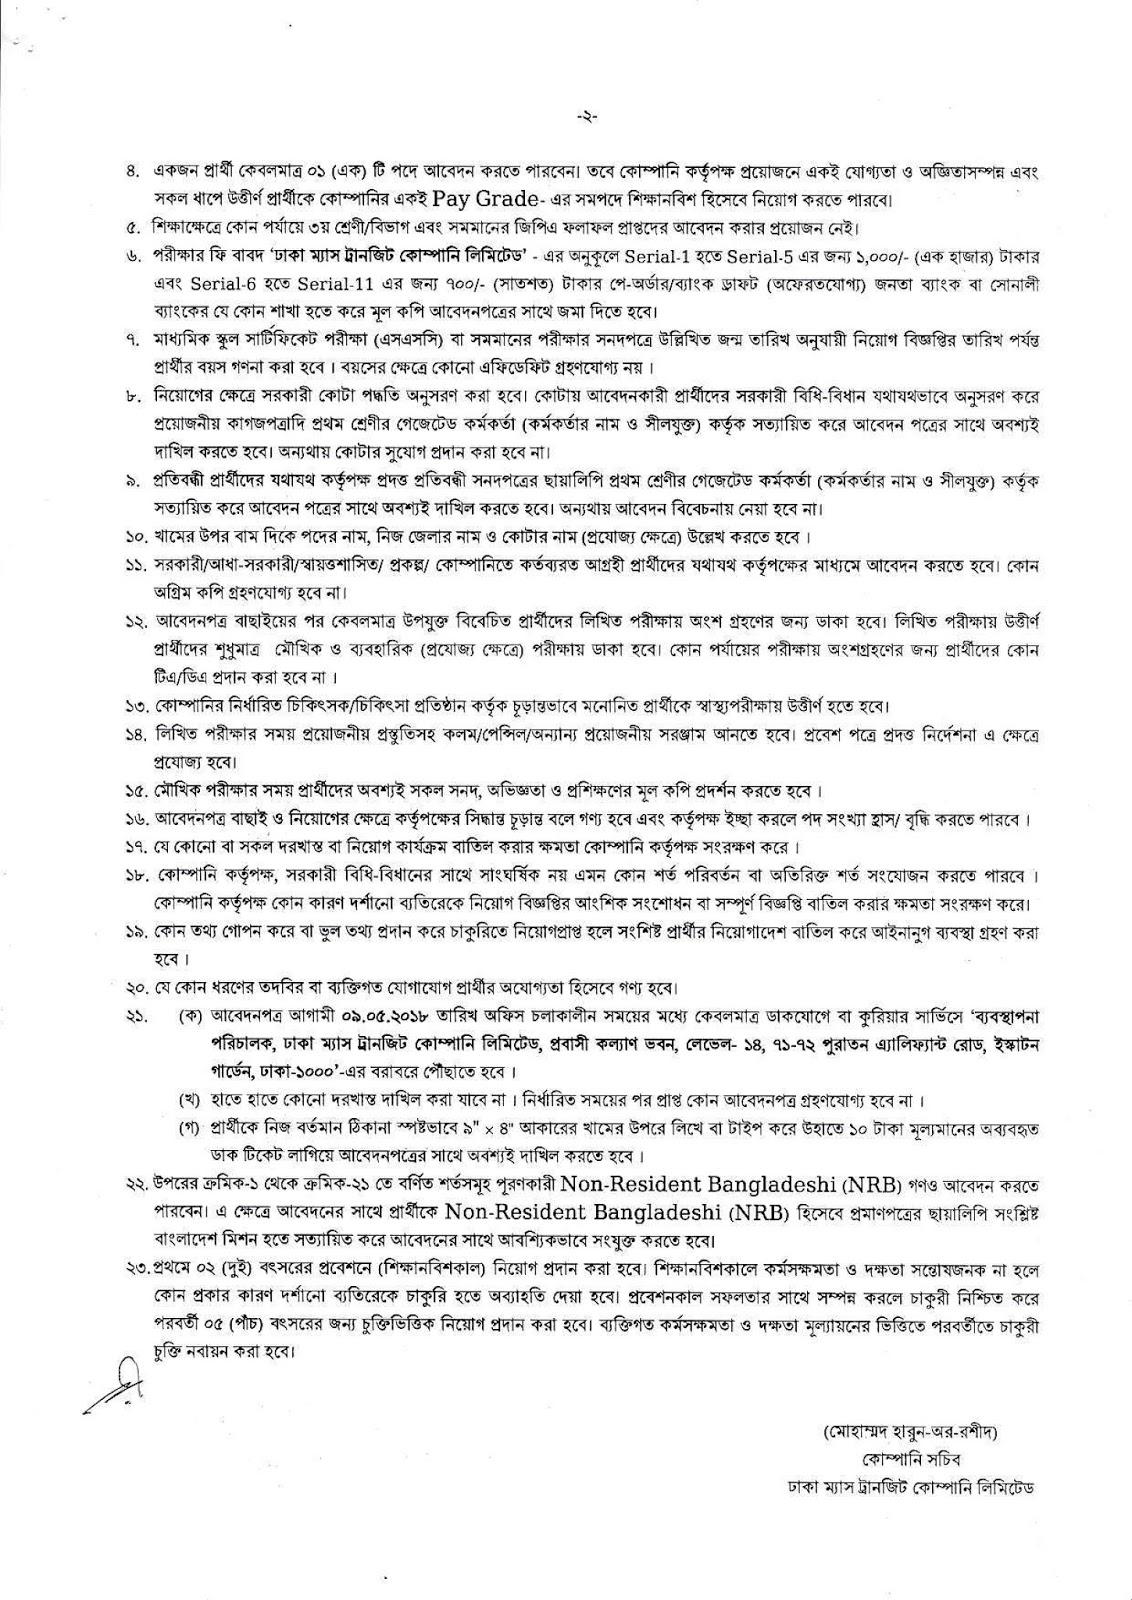 Dhaka Mass Transit Company Ltd. (DMTCL) Job Circular 2018